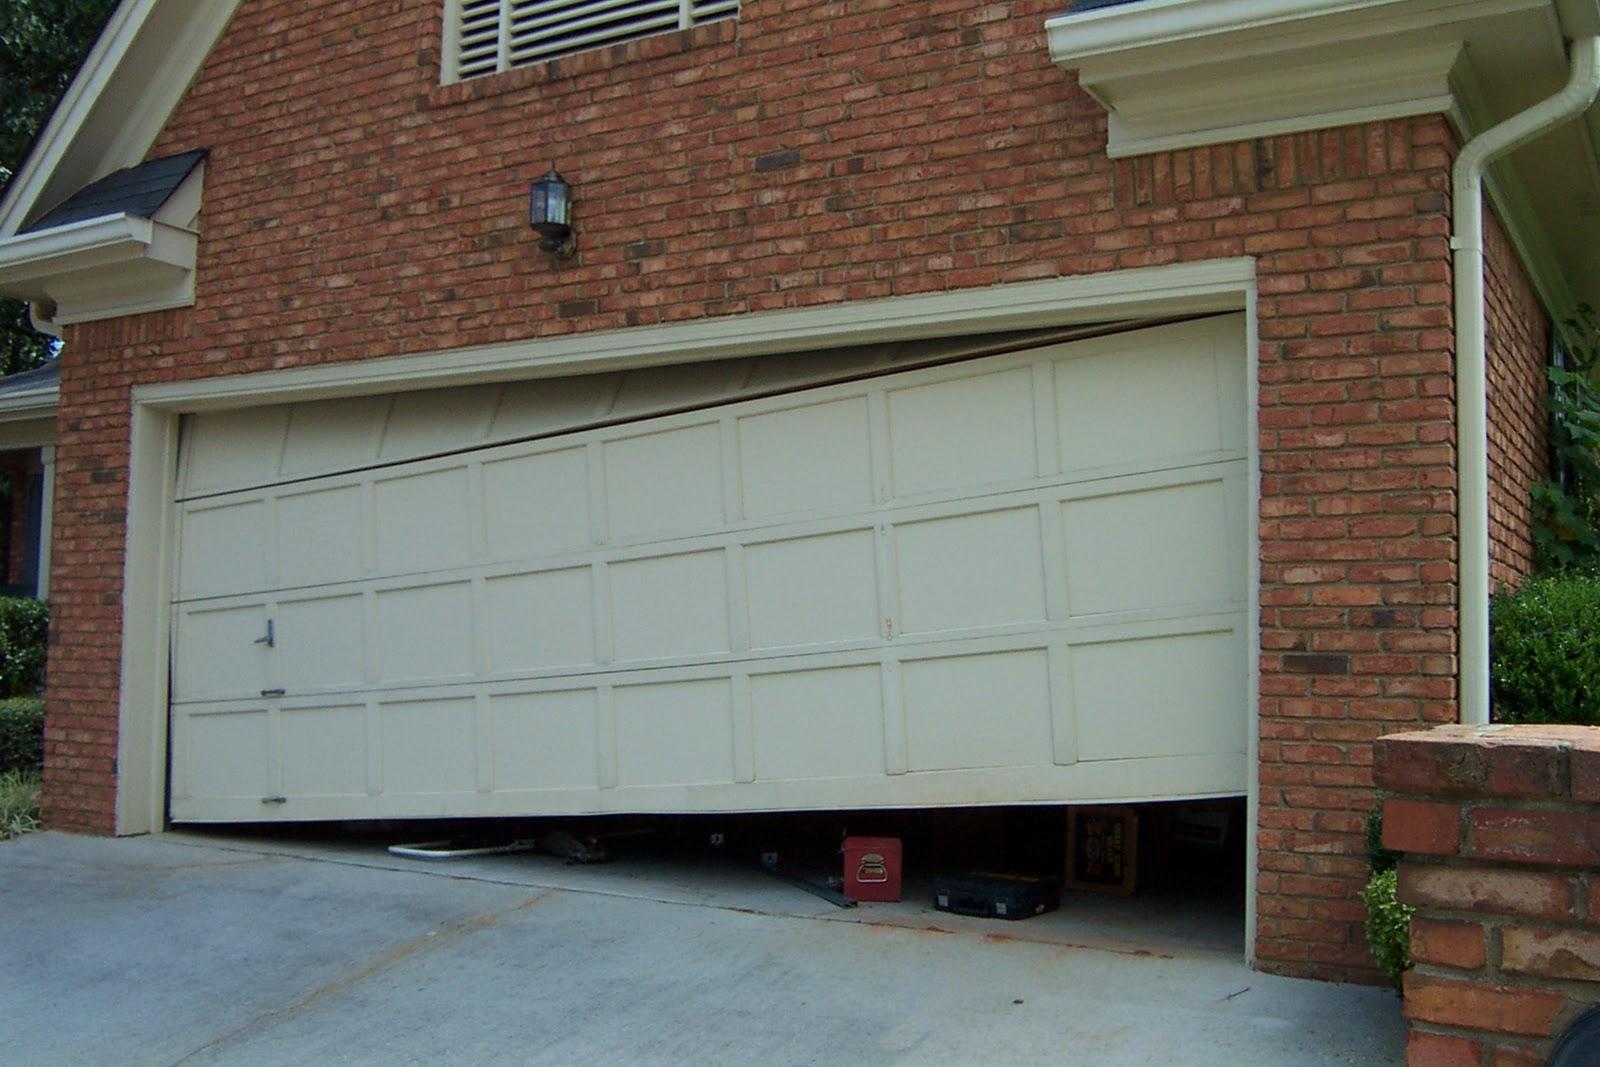 Garage door company cerritos ca a quality garage doors 714 523 7900 rubansaba